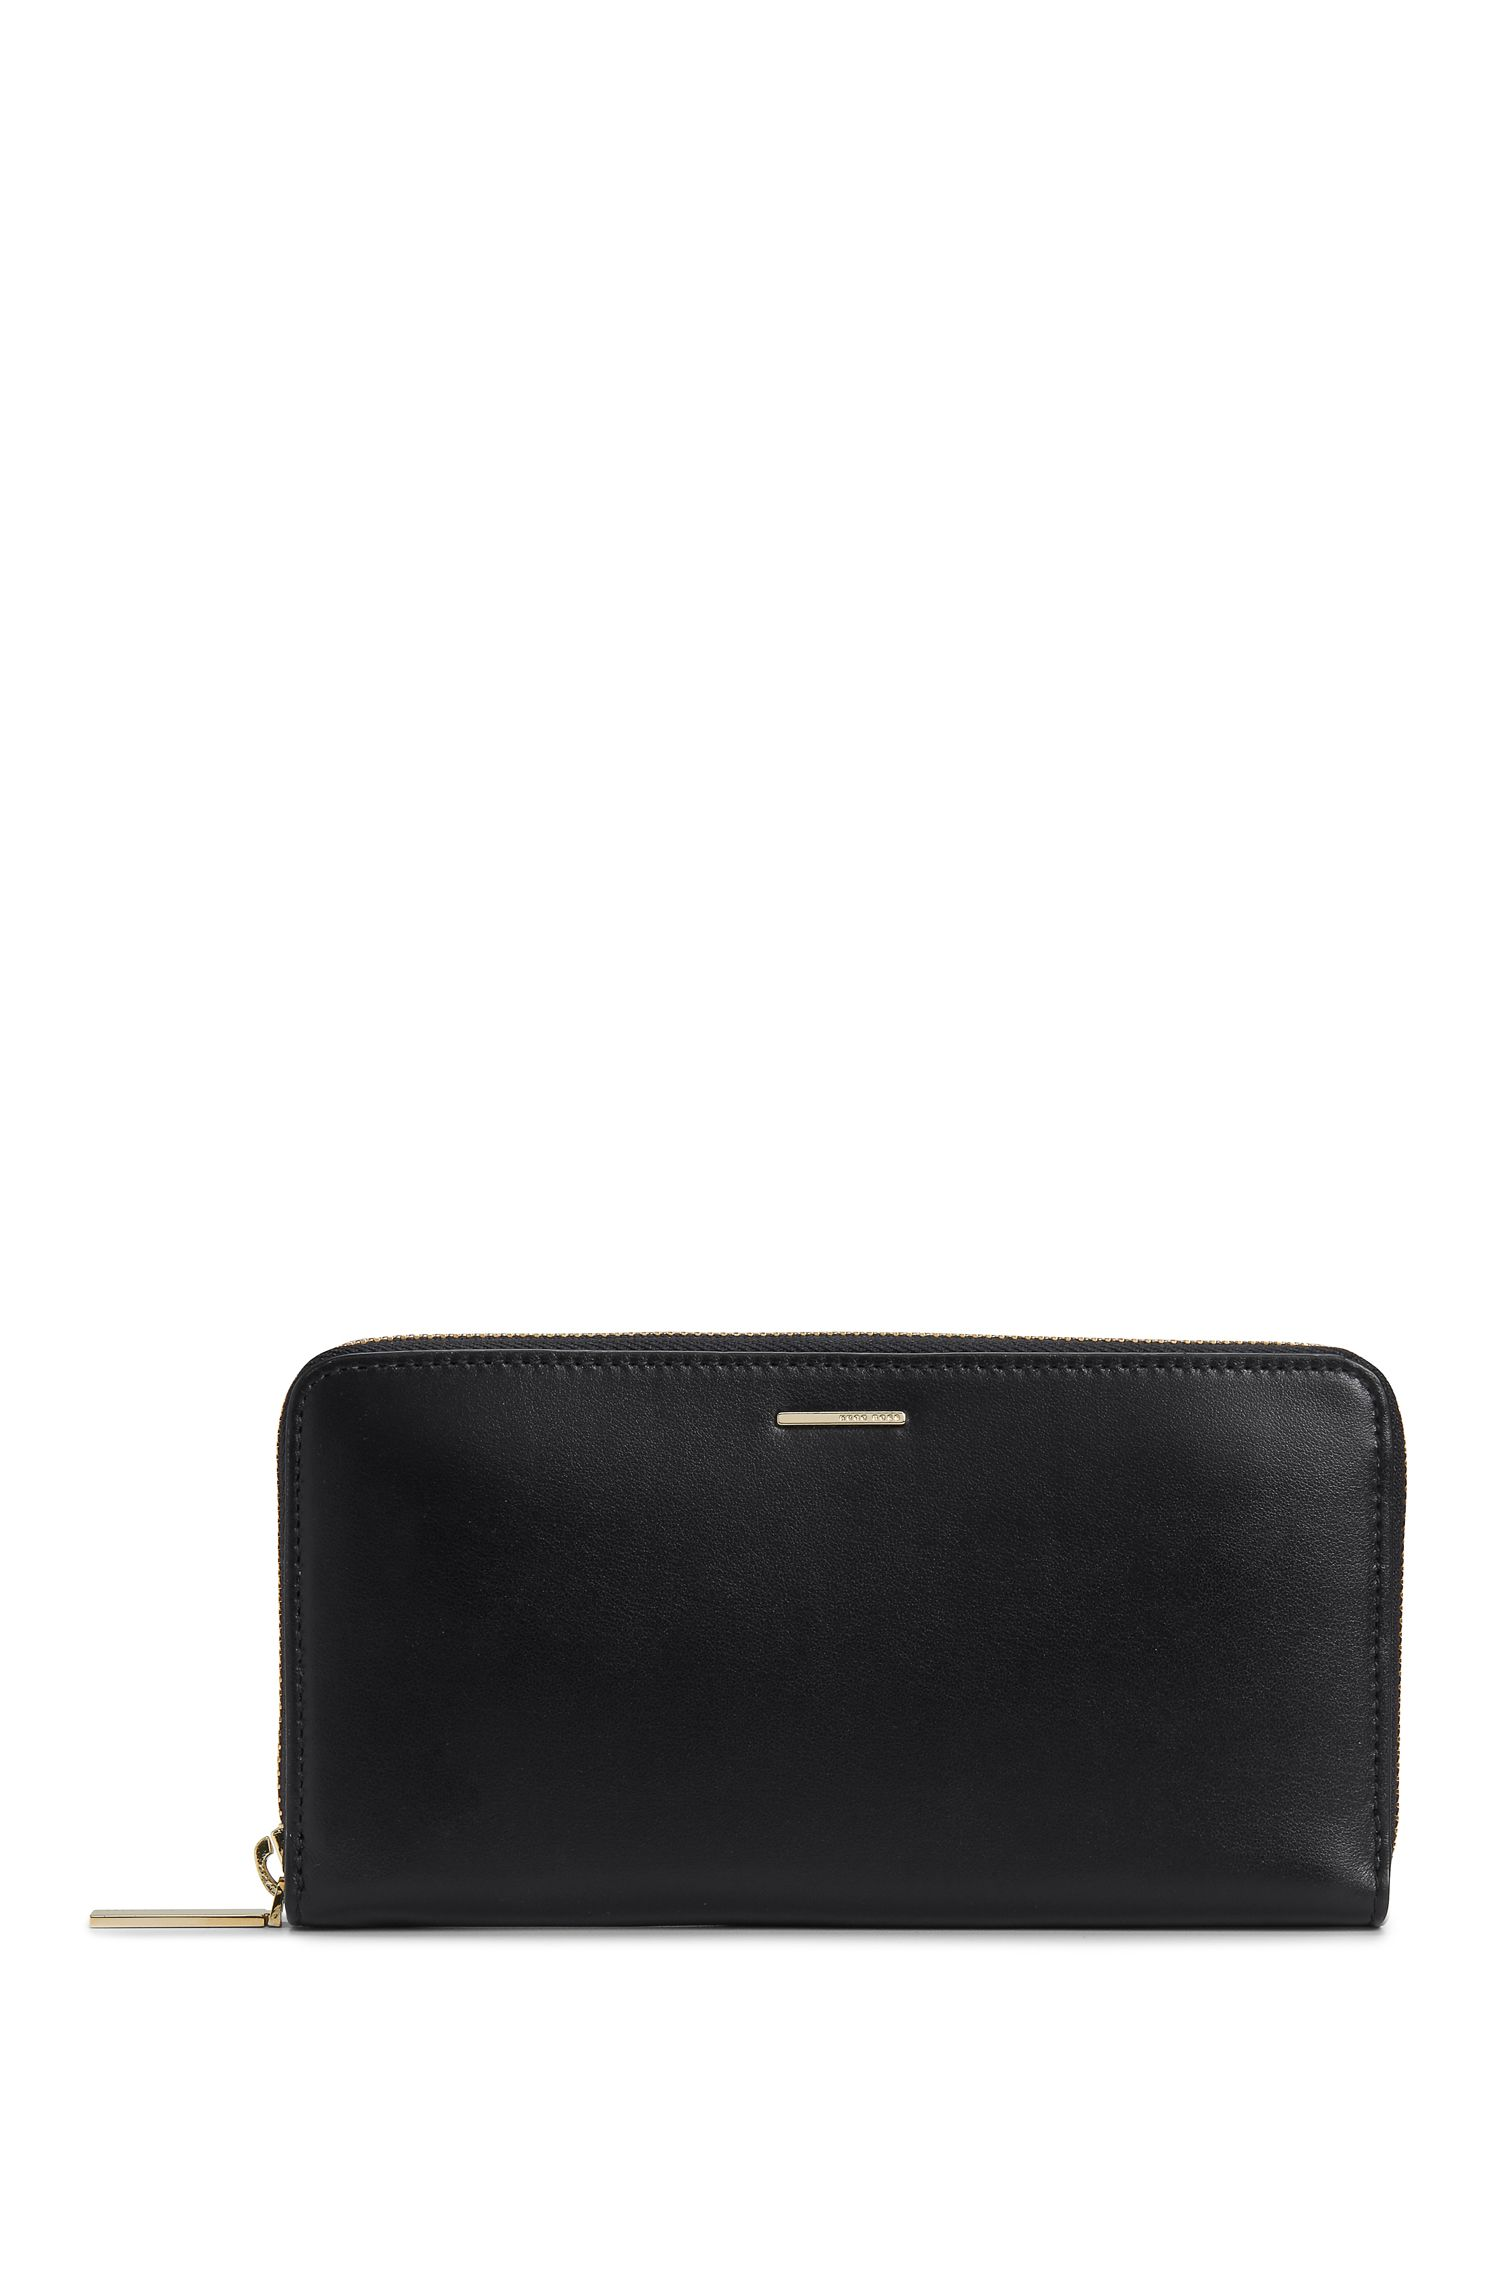 'Staple Ziparound N' | Leather Zip Wallet